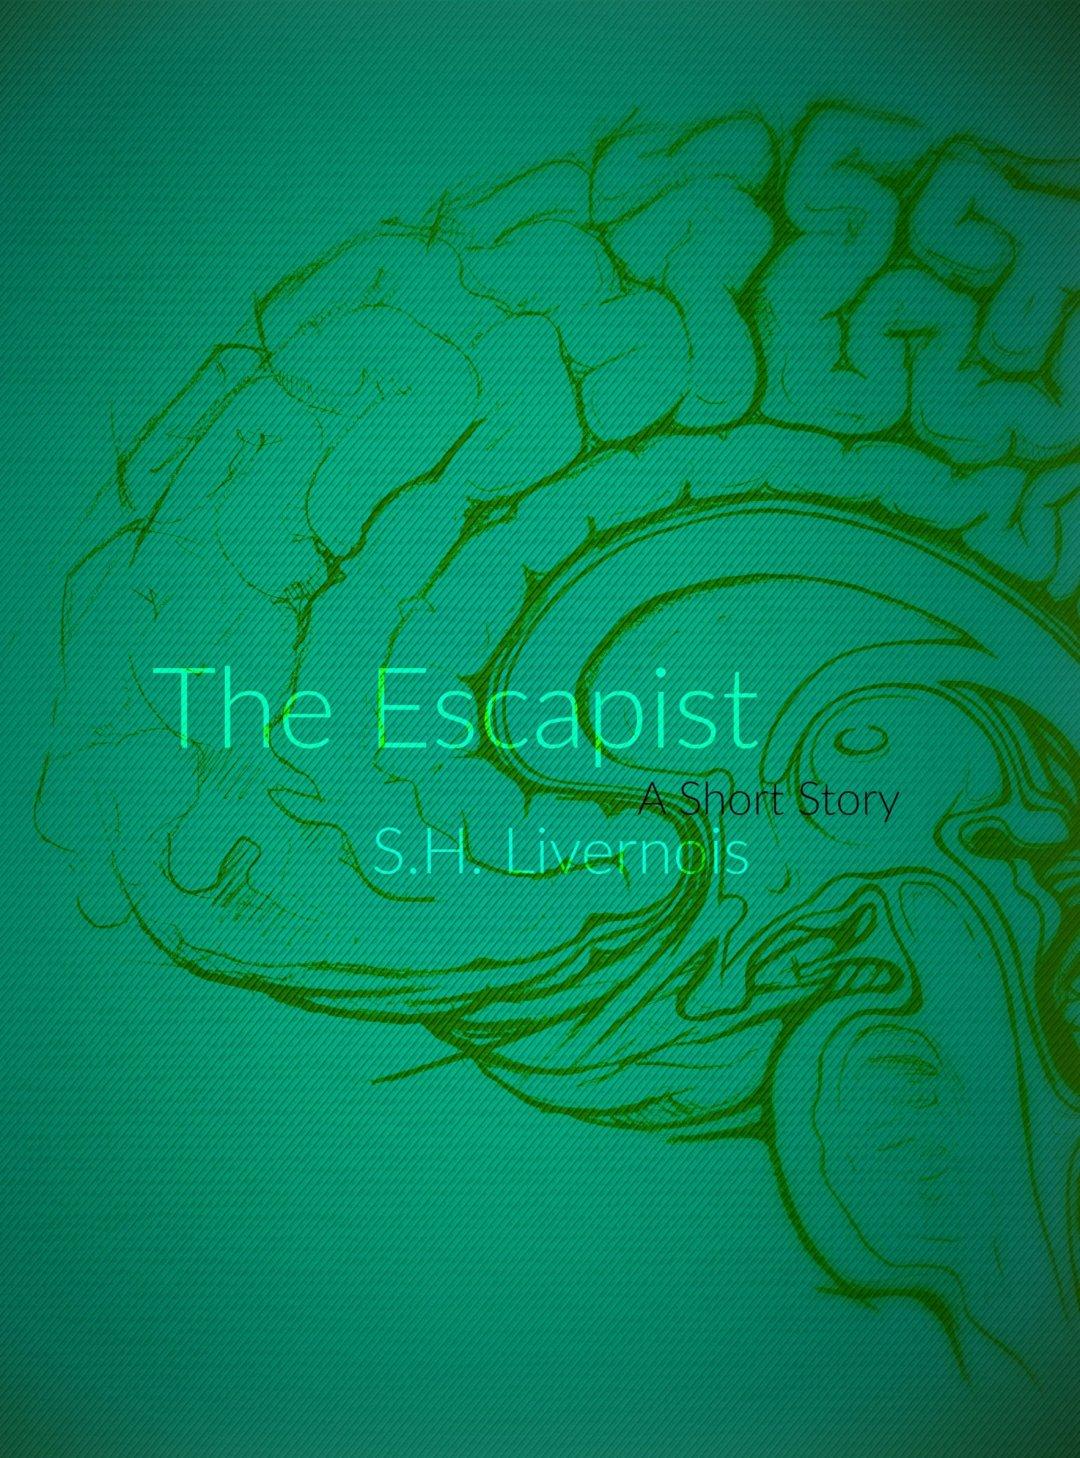 The Escapist by S.H. Livernois